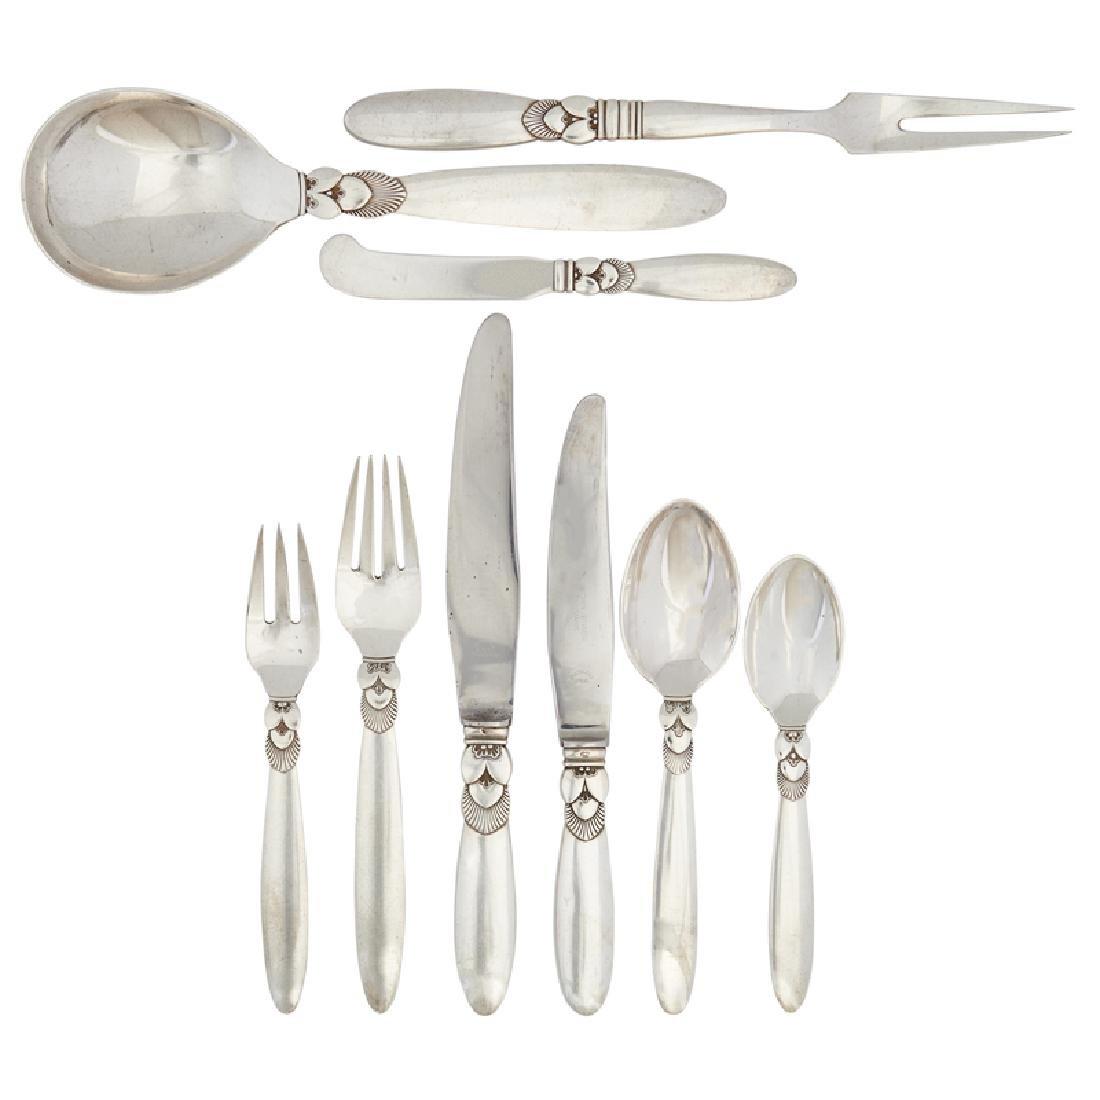 GEORGE JENSEN Assembled Cactus flatware set